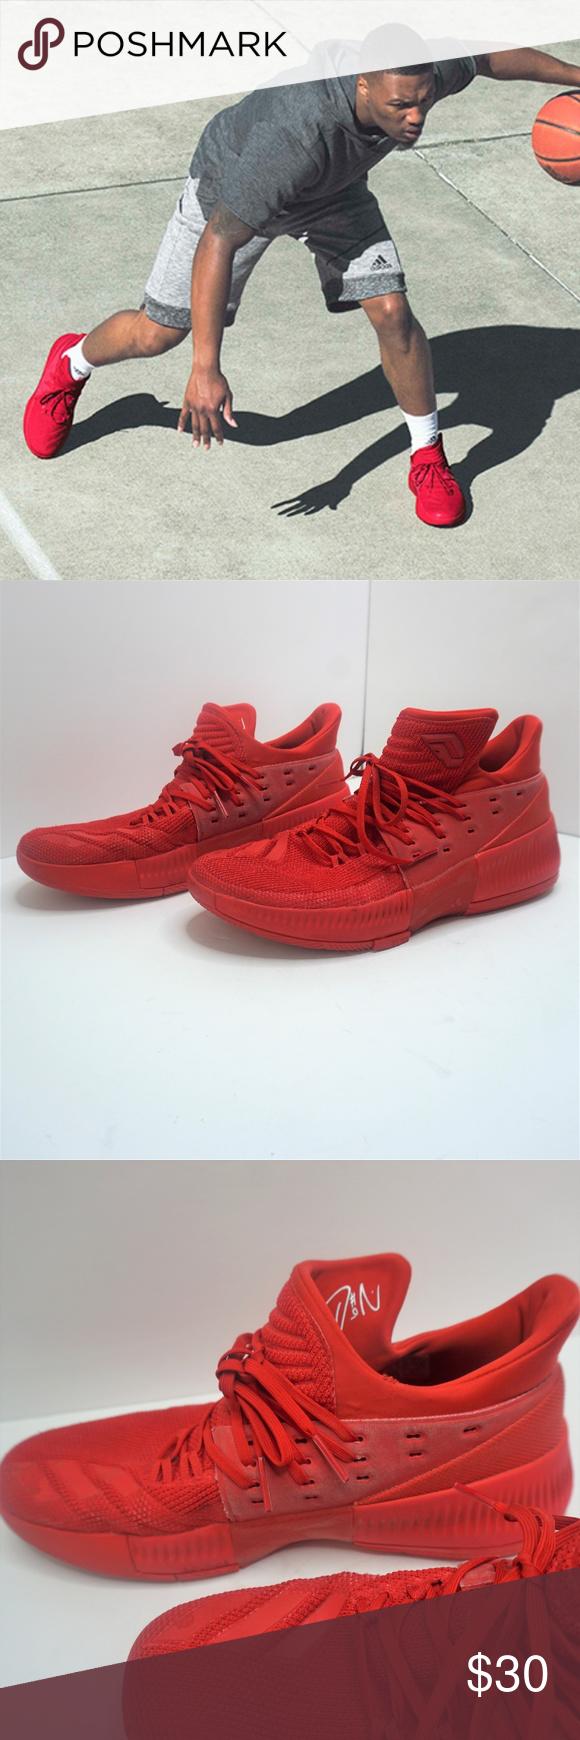 D LILLARD ADIDAS DAME 3 Roots triple red 11.5   Adidas dame. Adidas. Red adidas